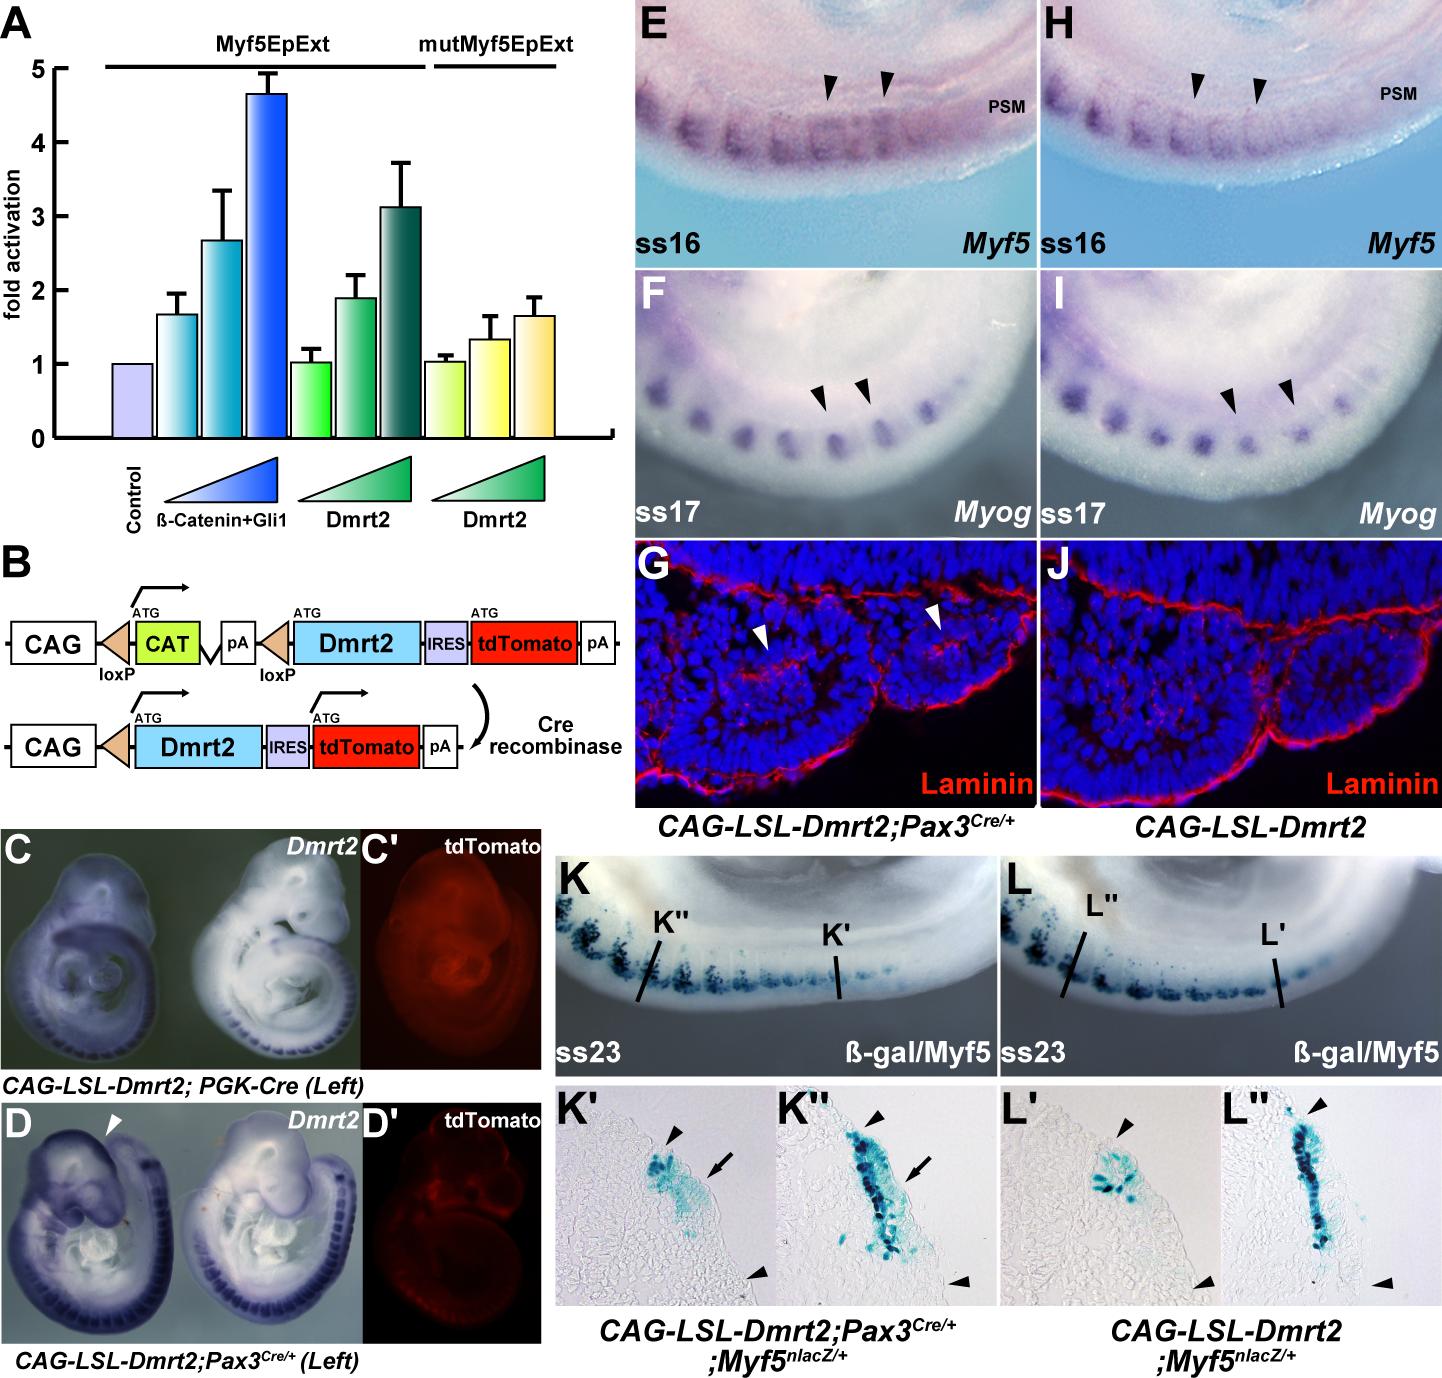 Overexpression of Dmrt2 accelerates myogenesis.